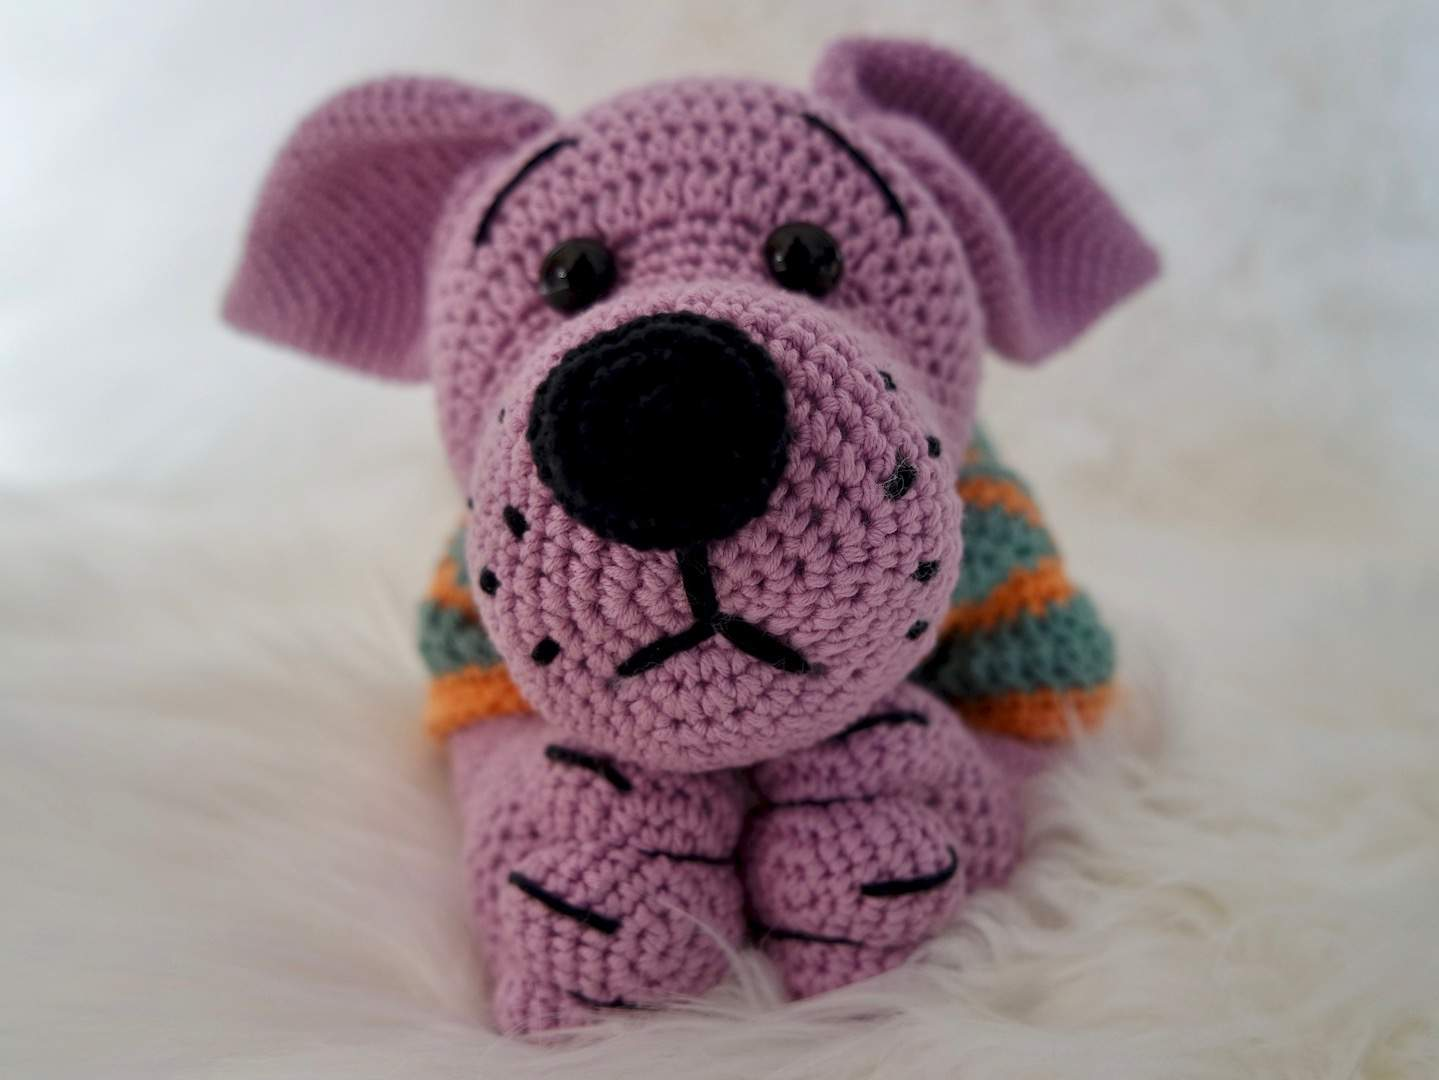 Hippo in swimsuit crochet pattern - Amigurumi Today | 1080x1439